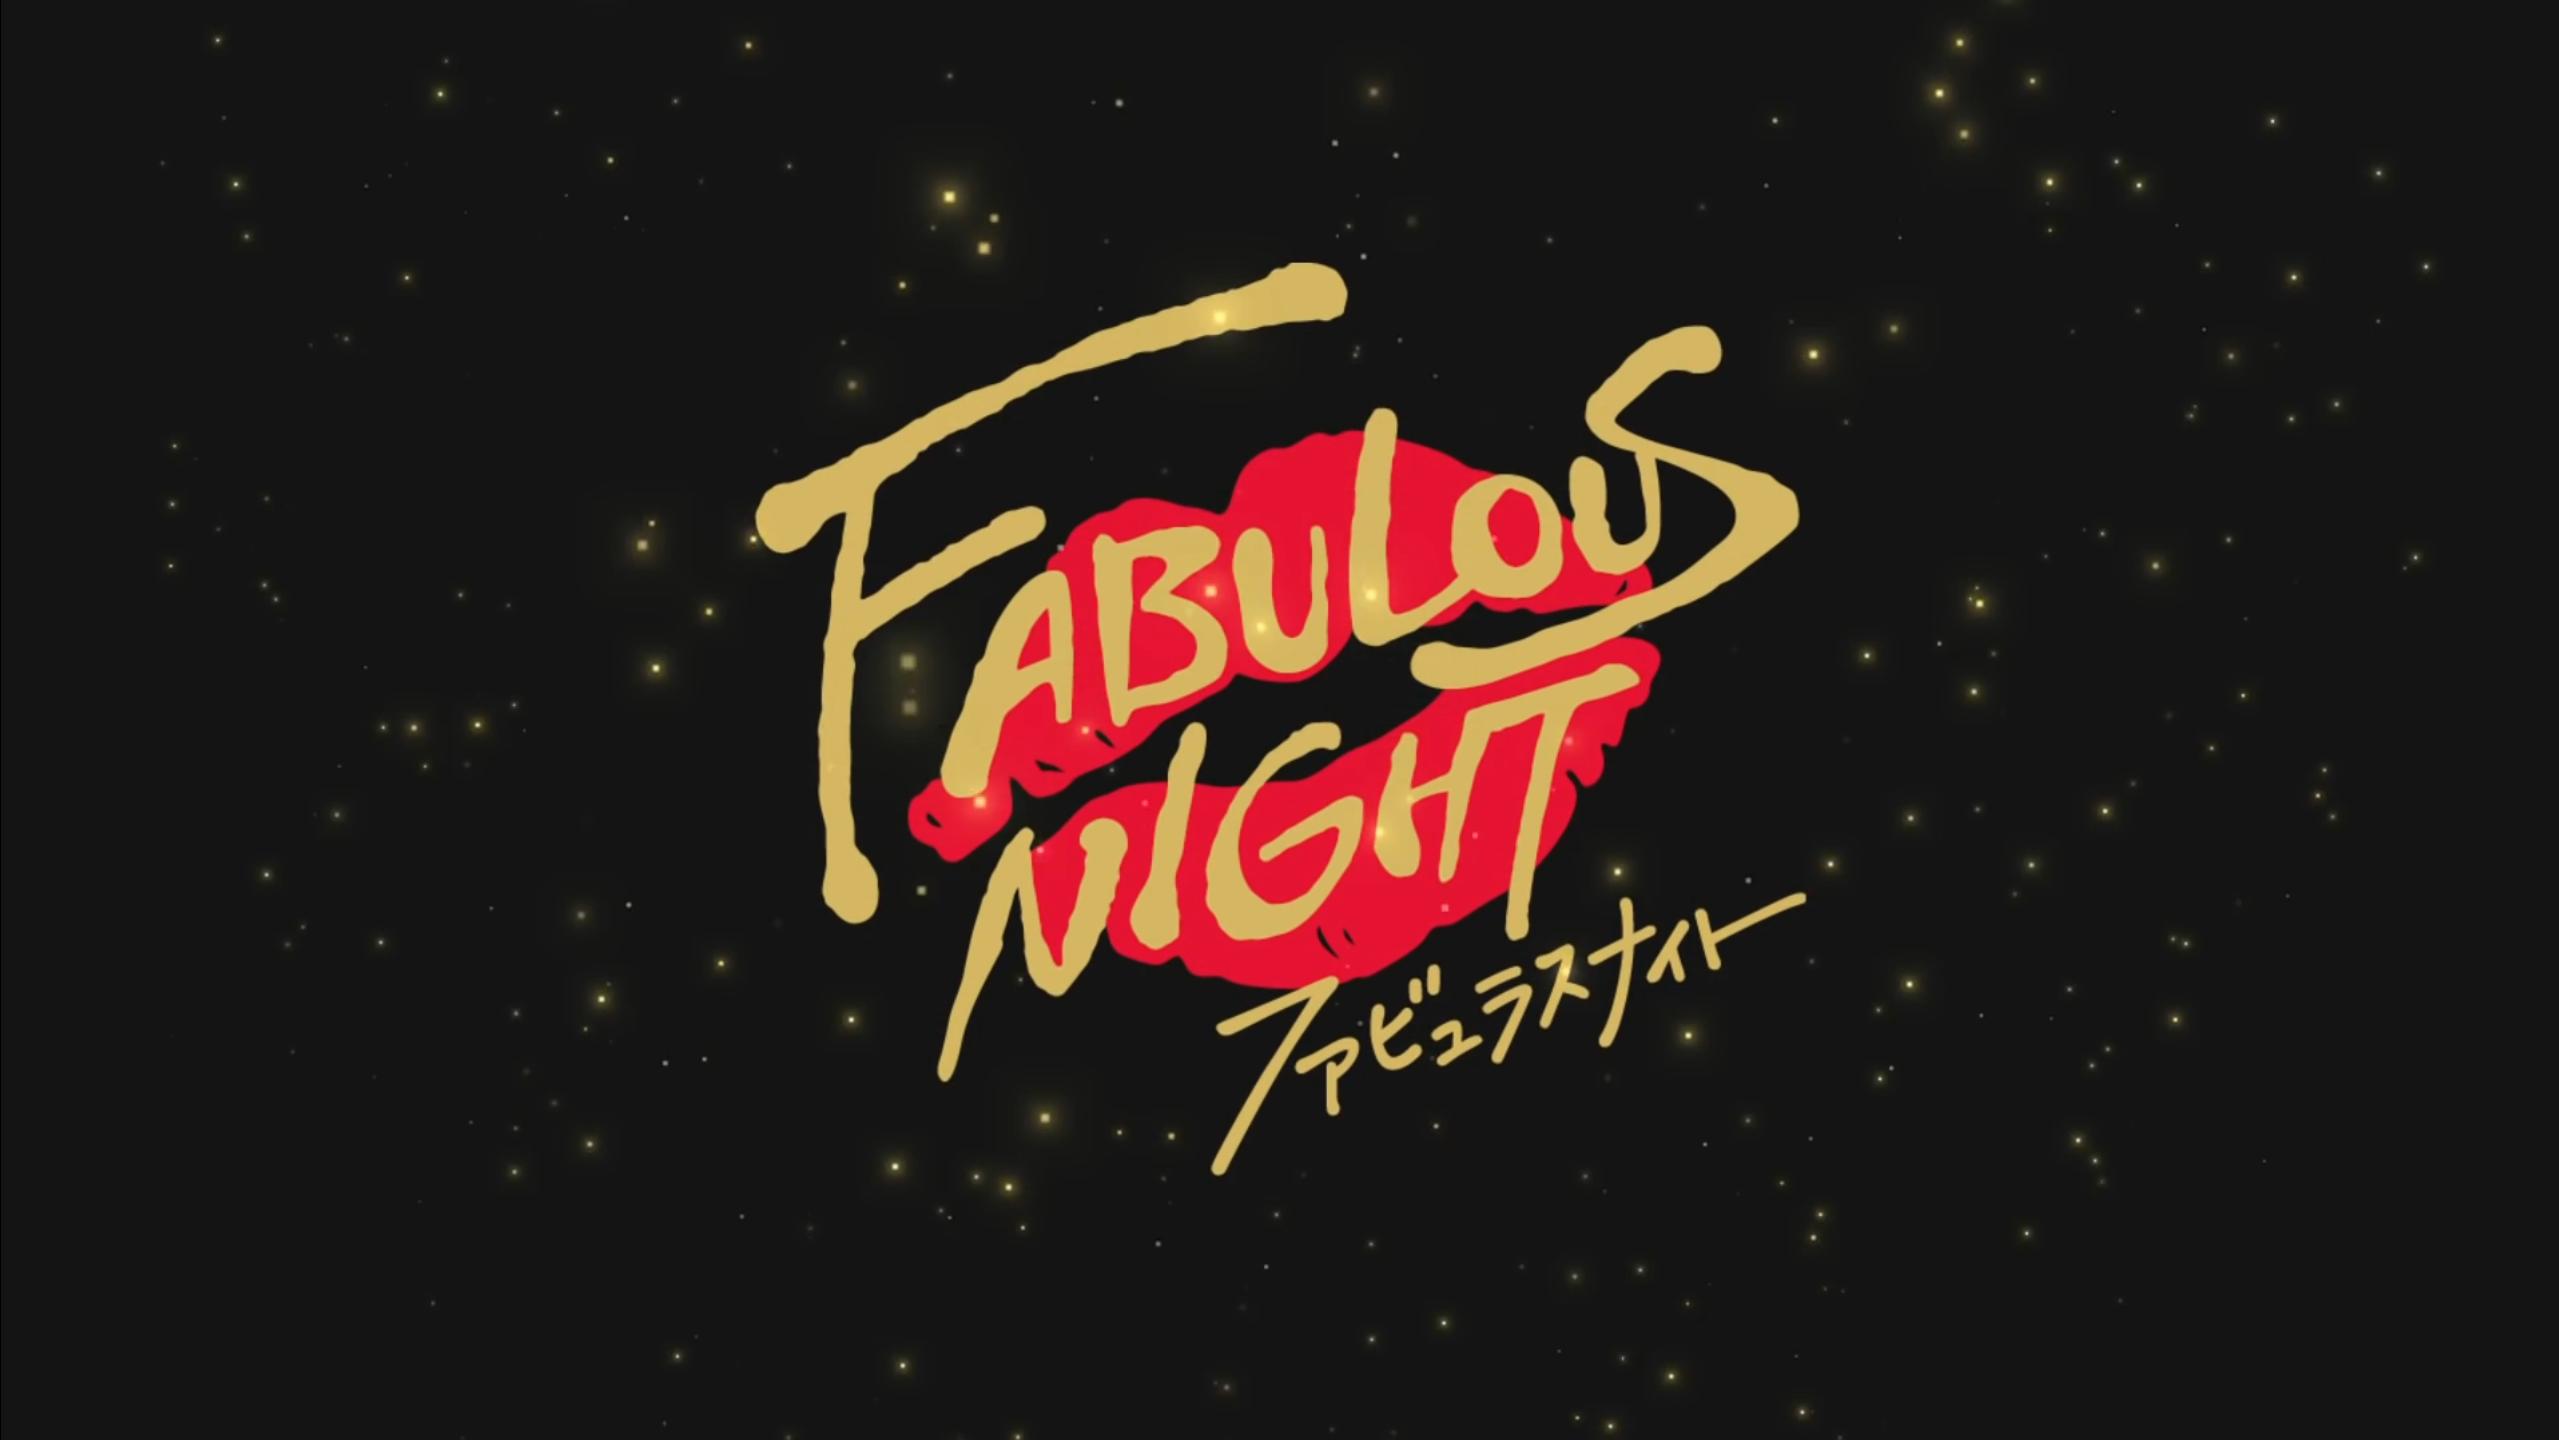 FABULOUS NIGHT 游戏截图1